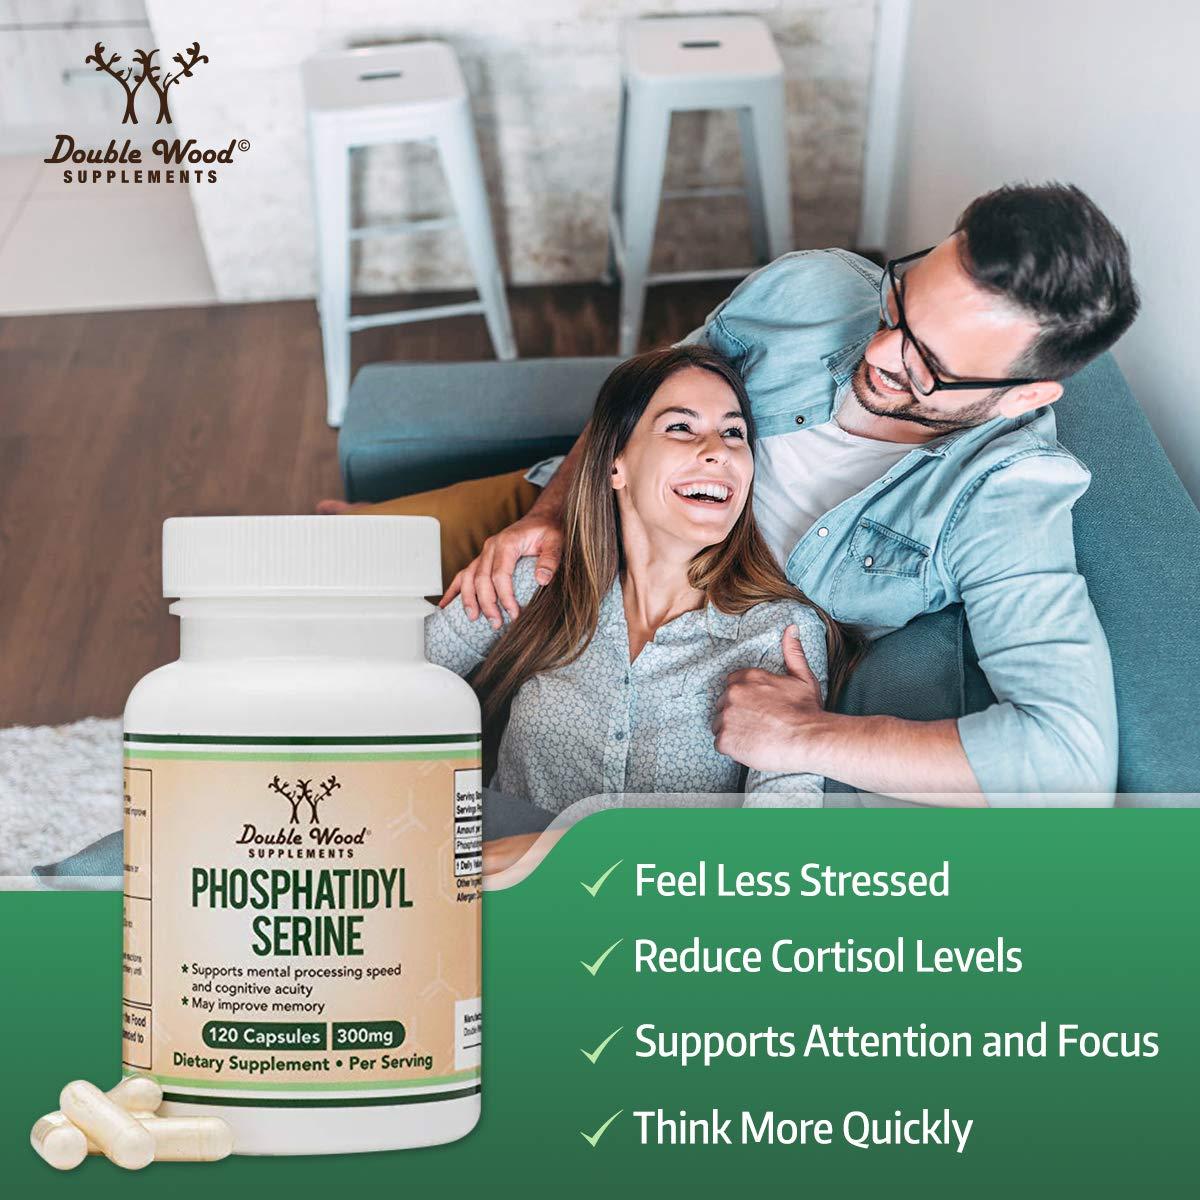 PhosphatidylSerine 300mg Per Serving, Made in The USA, 120 Capsules (Phosphatidyl Serine Complex) by Double Wood Supplements by Double Wood Supplements (Image #4)